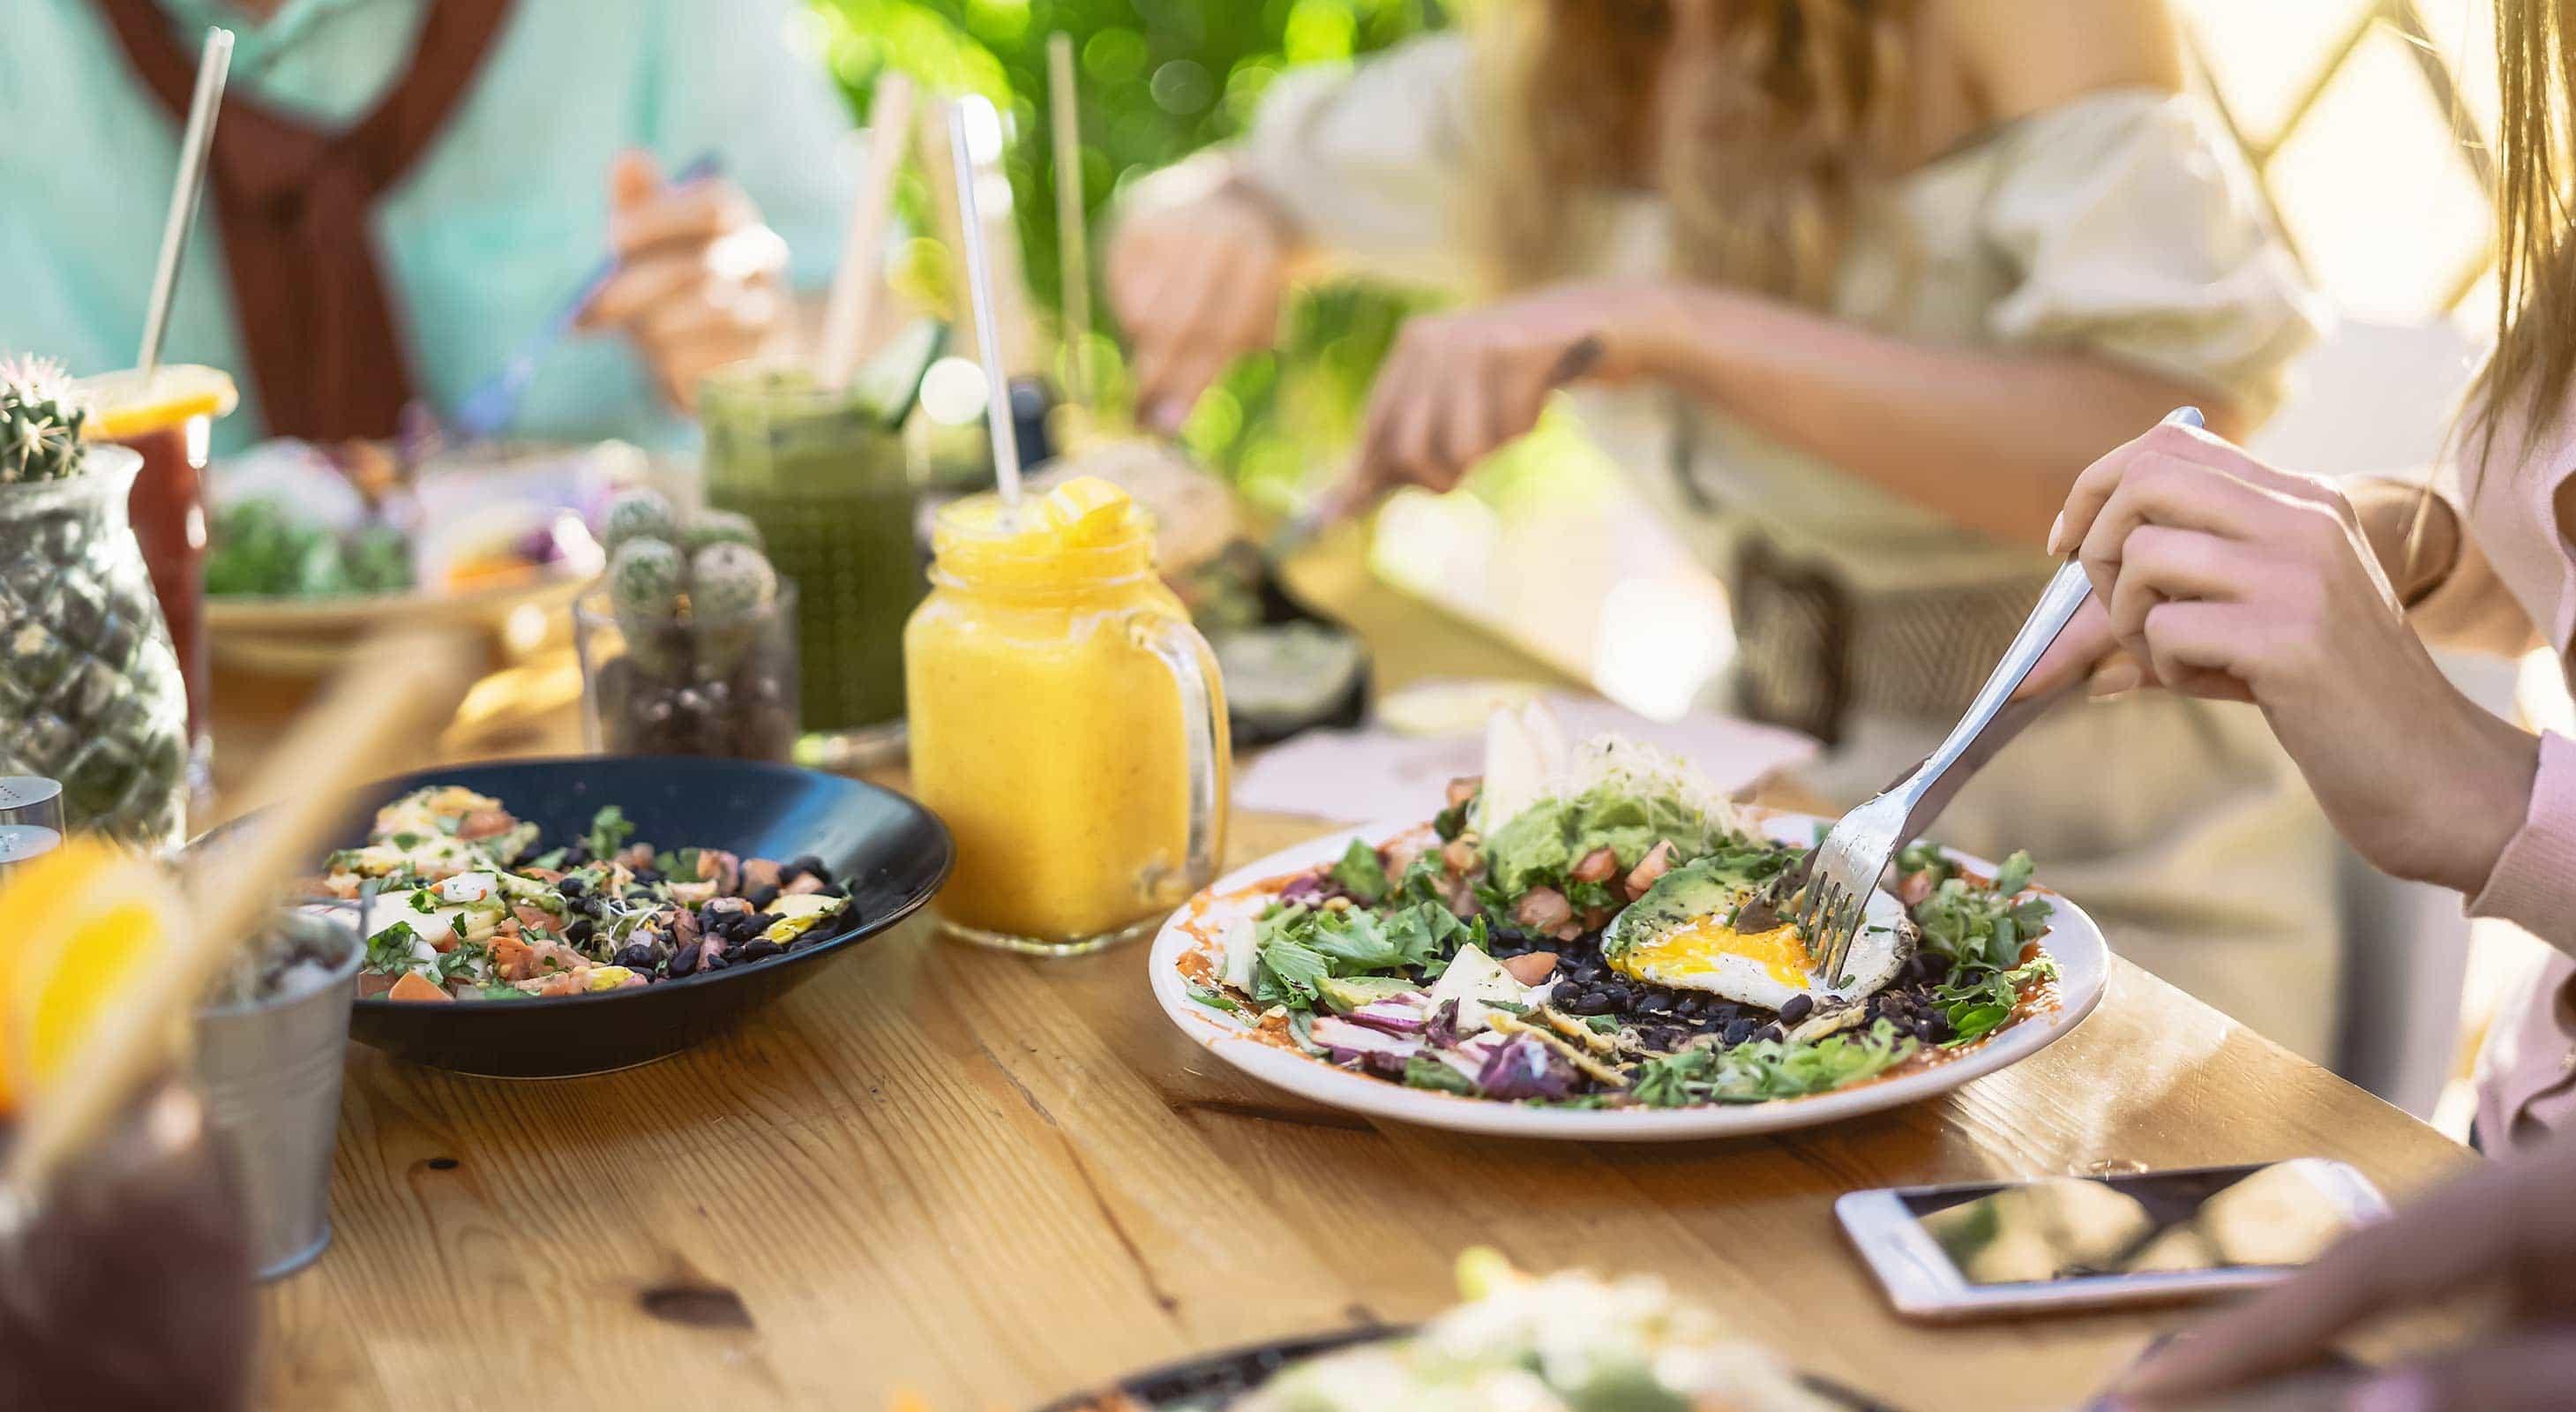 Meals at Peterborough, NH restaurants